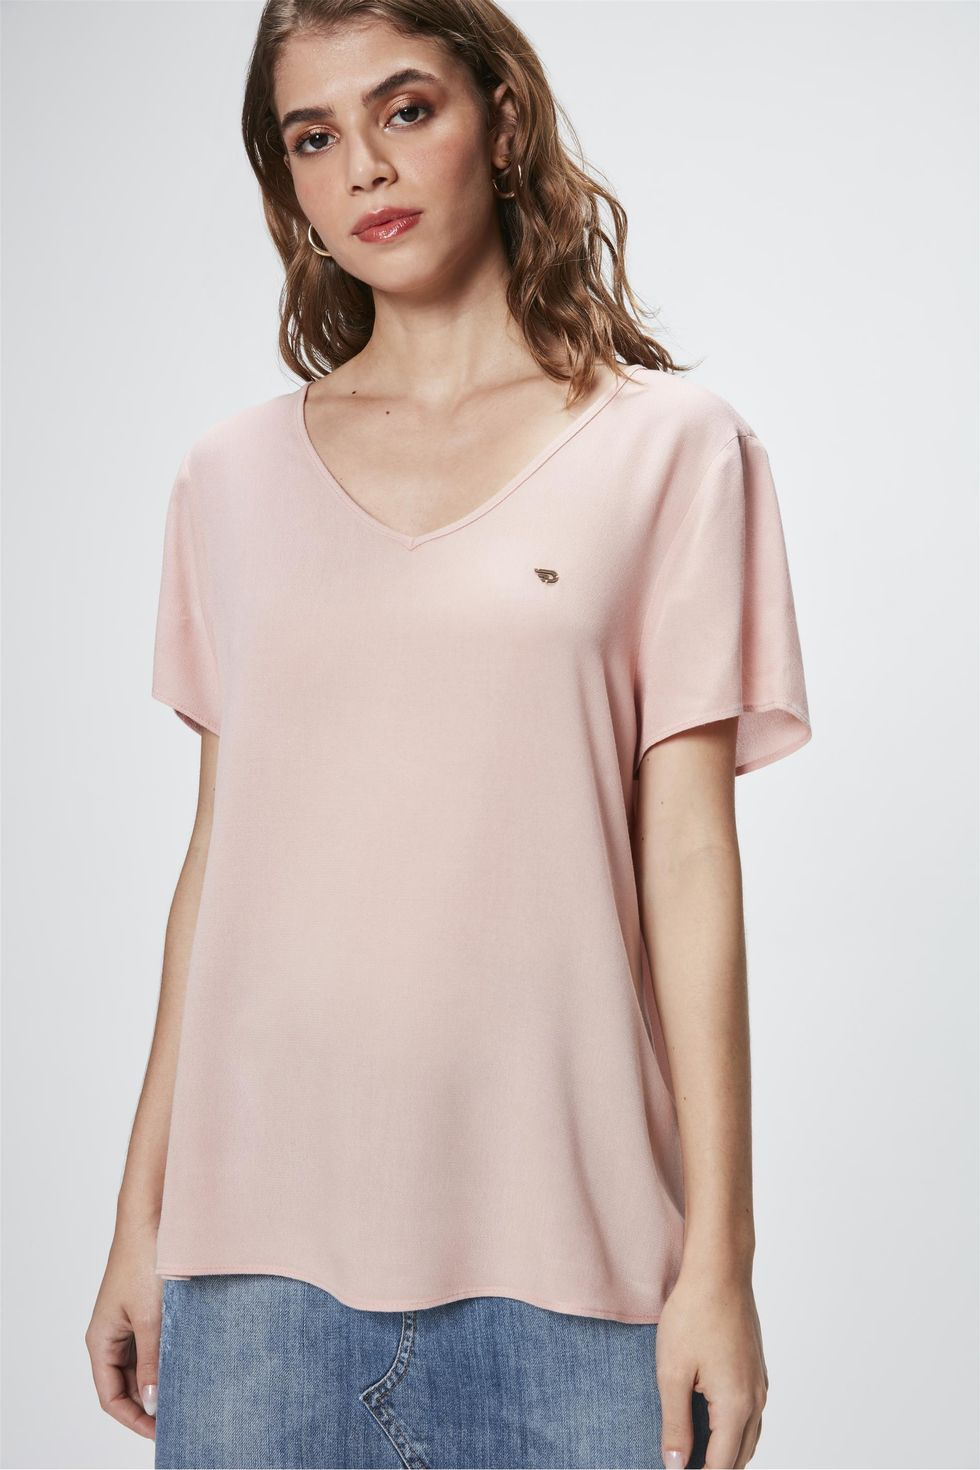 Camiseta-Basica-Decote-V-Feminina-Frente--